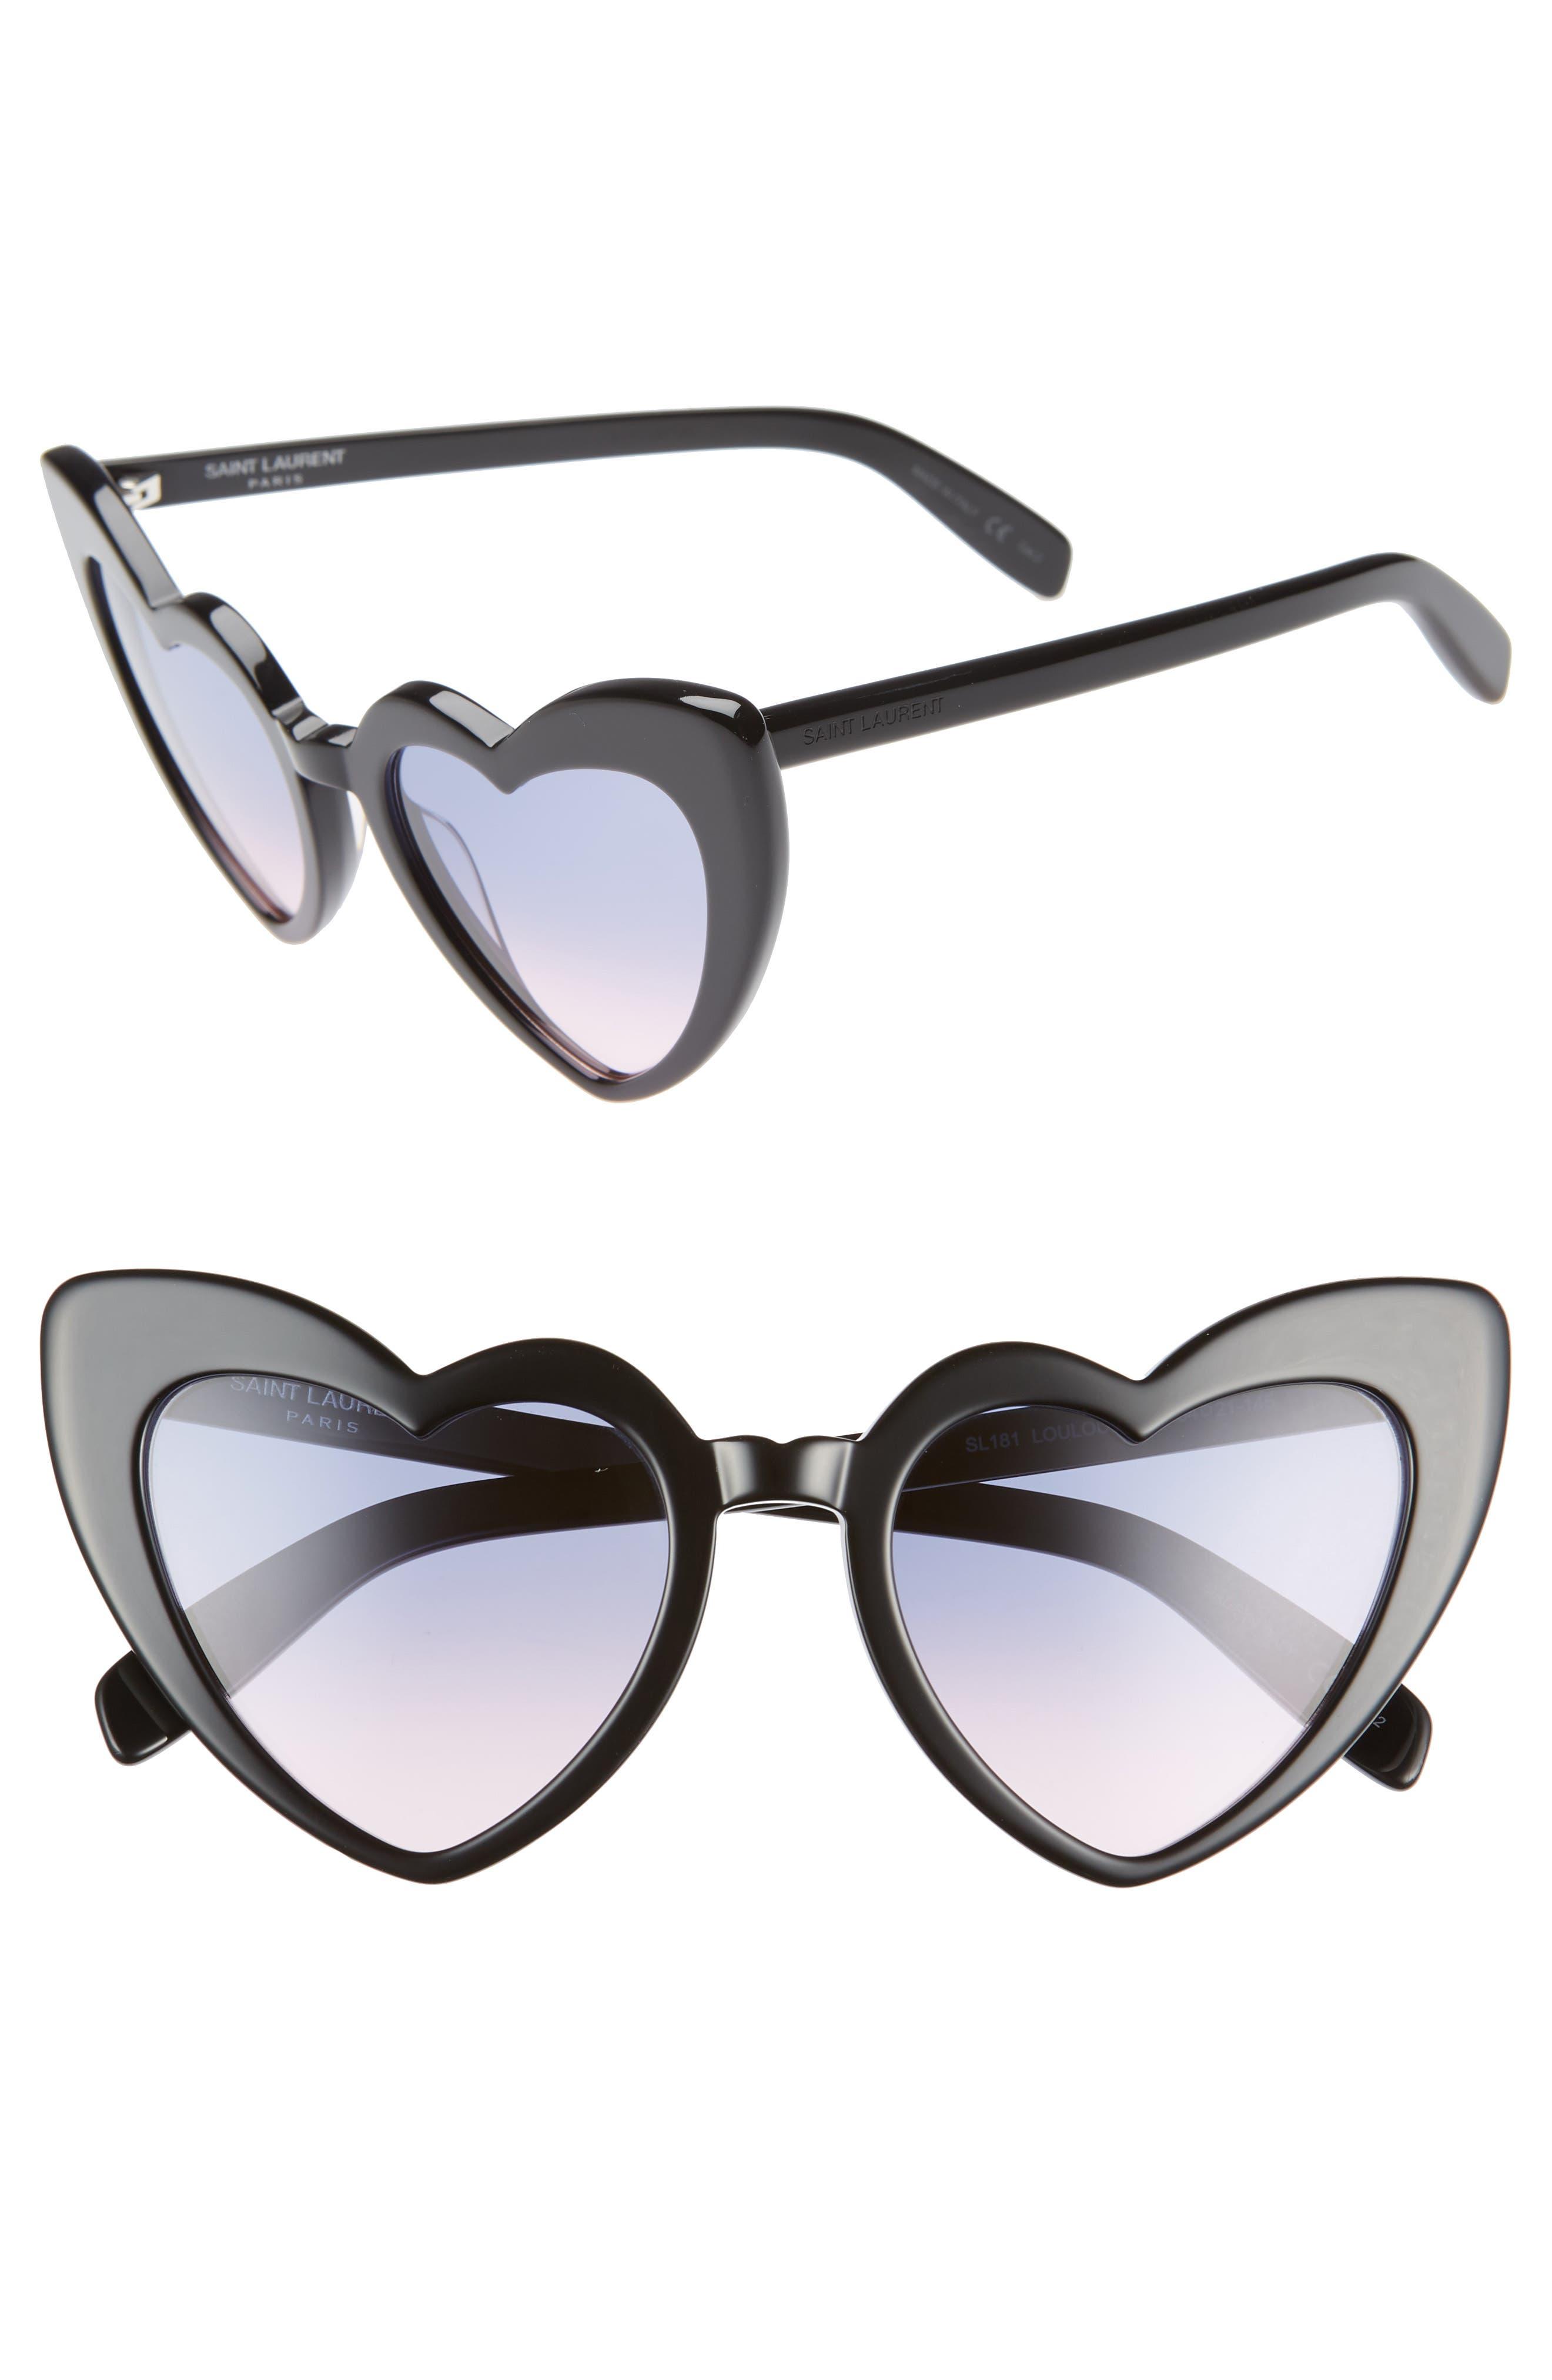 92a05cbe4e150 Saint Laurent Sunglasses